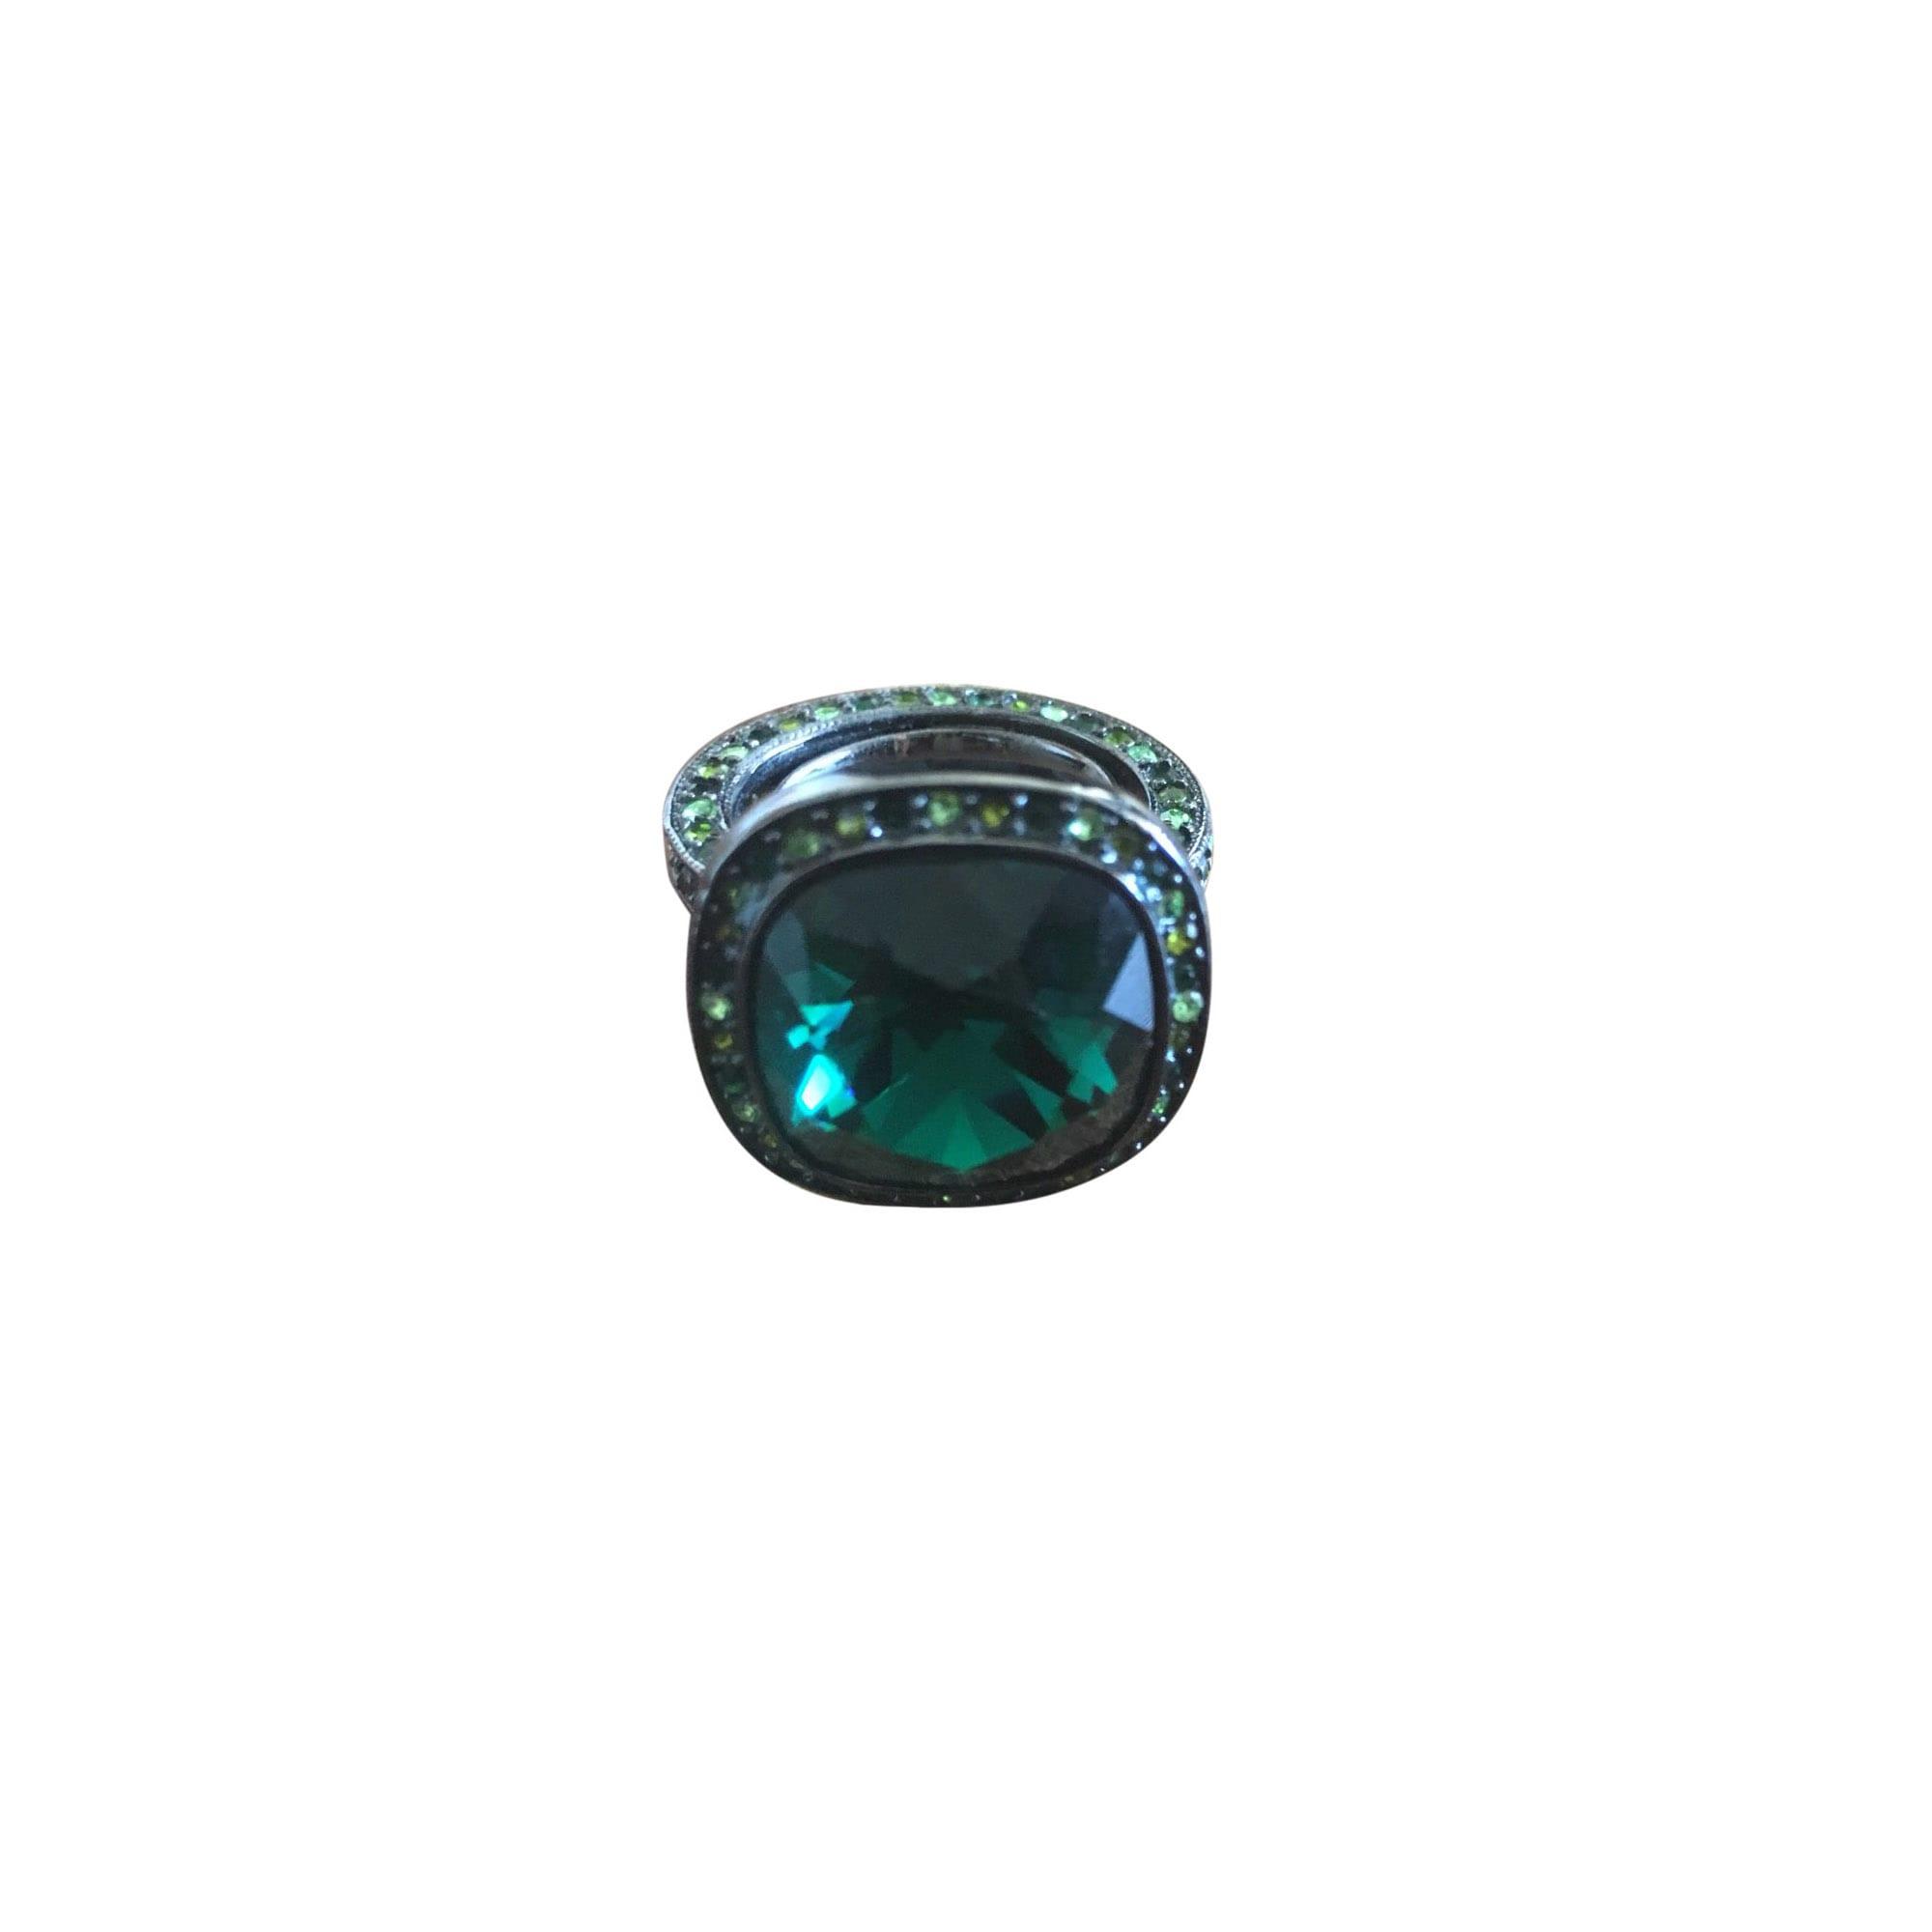 Bague KENNETH JAY LANE chrome vert Adjustable size